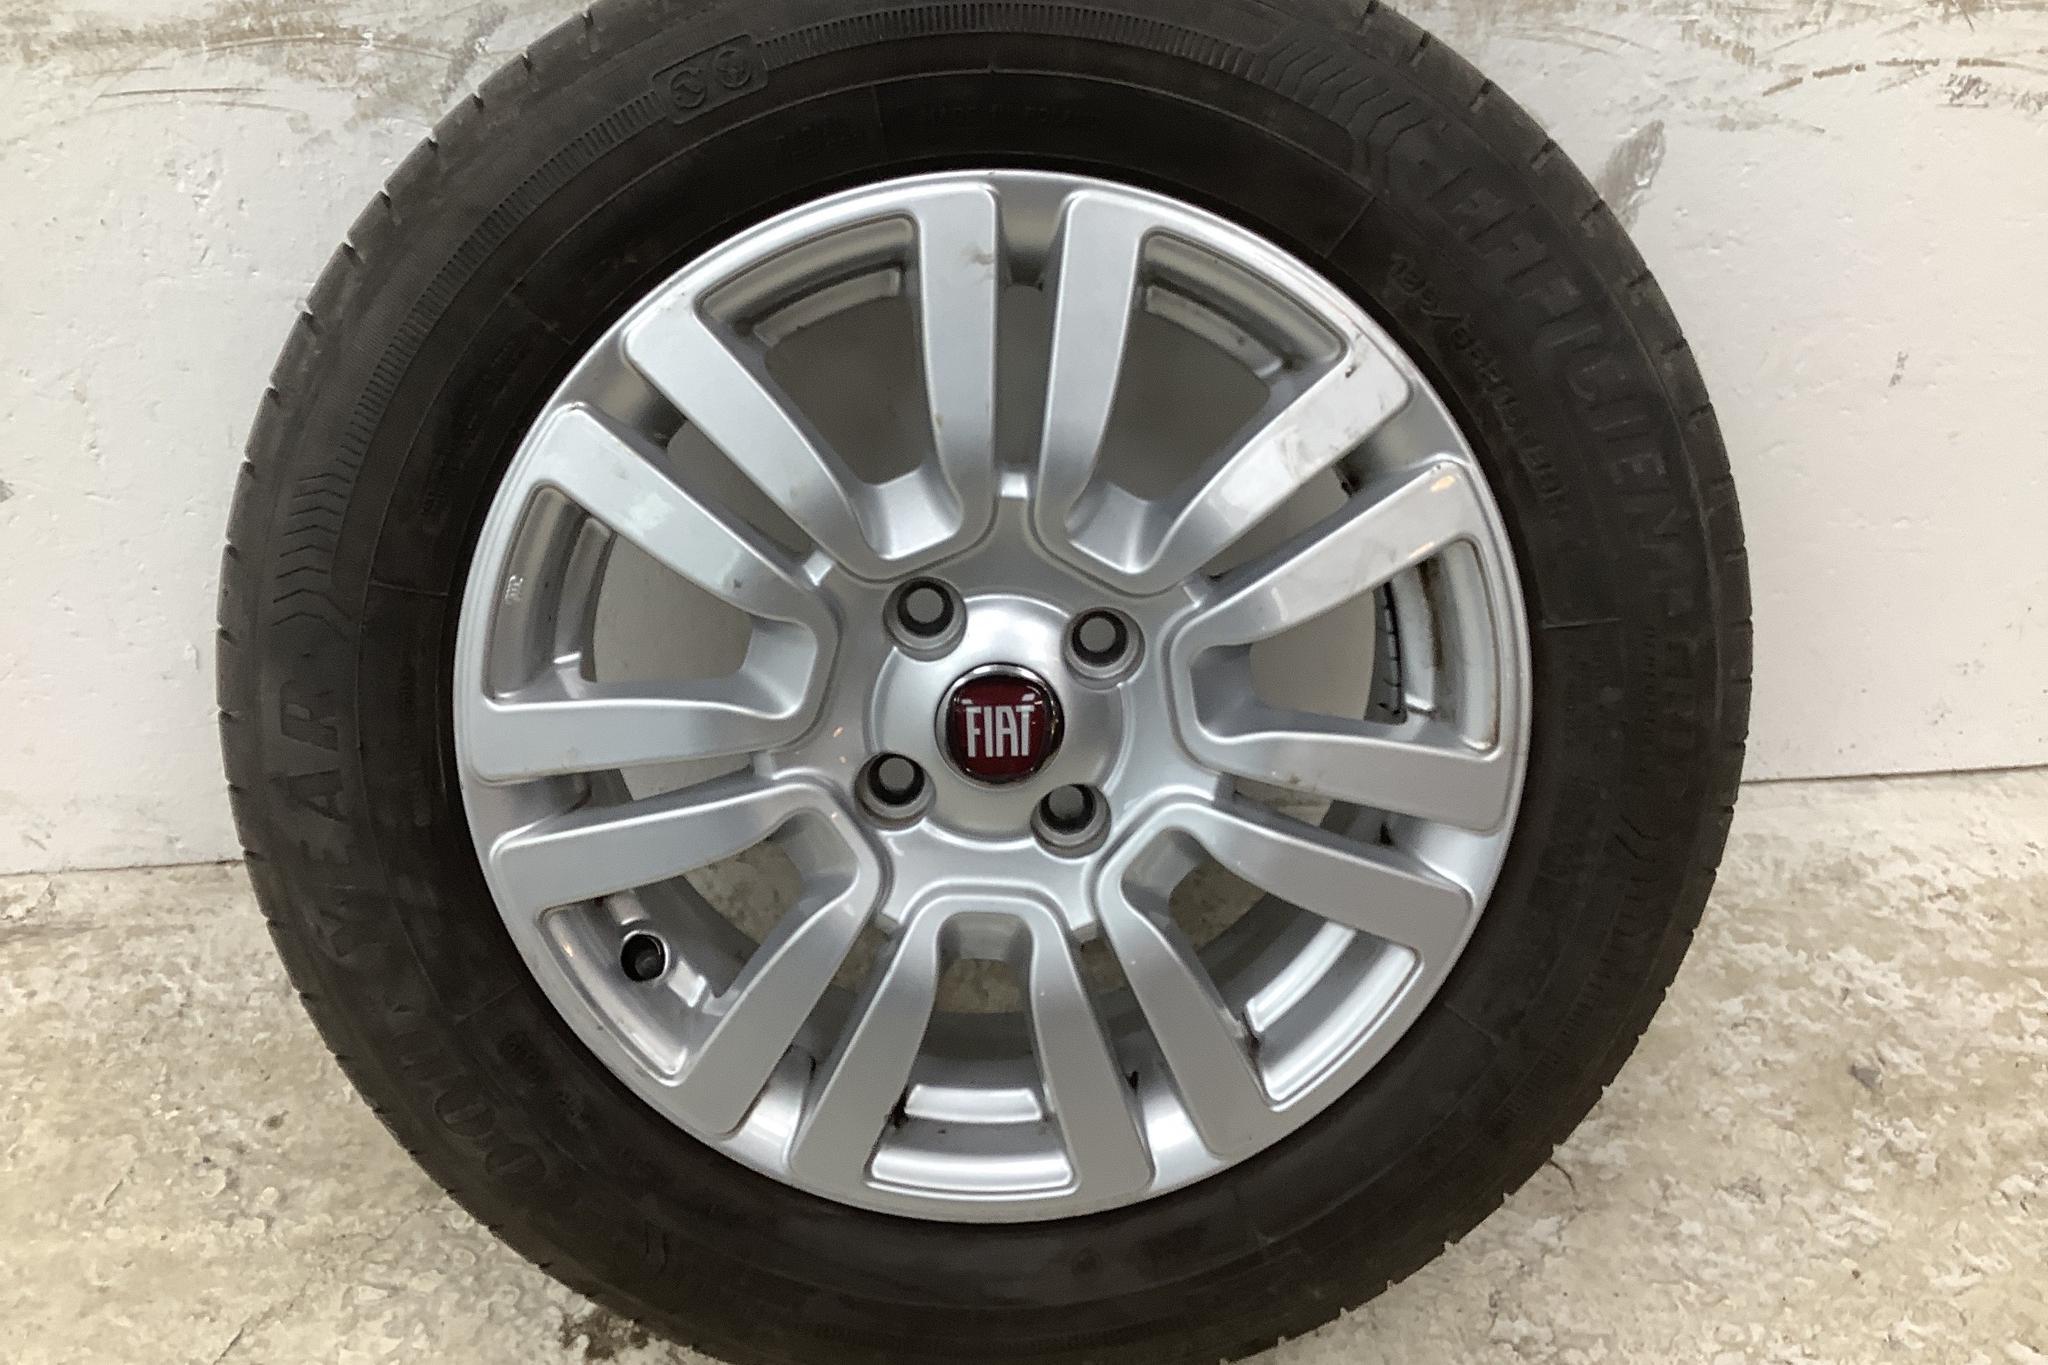 Fiat Punto 1.4 Natural Power 5dr (70hk) - 3 063 mil - Manuell - svart - 2014